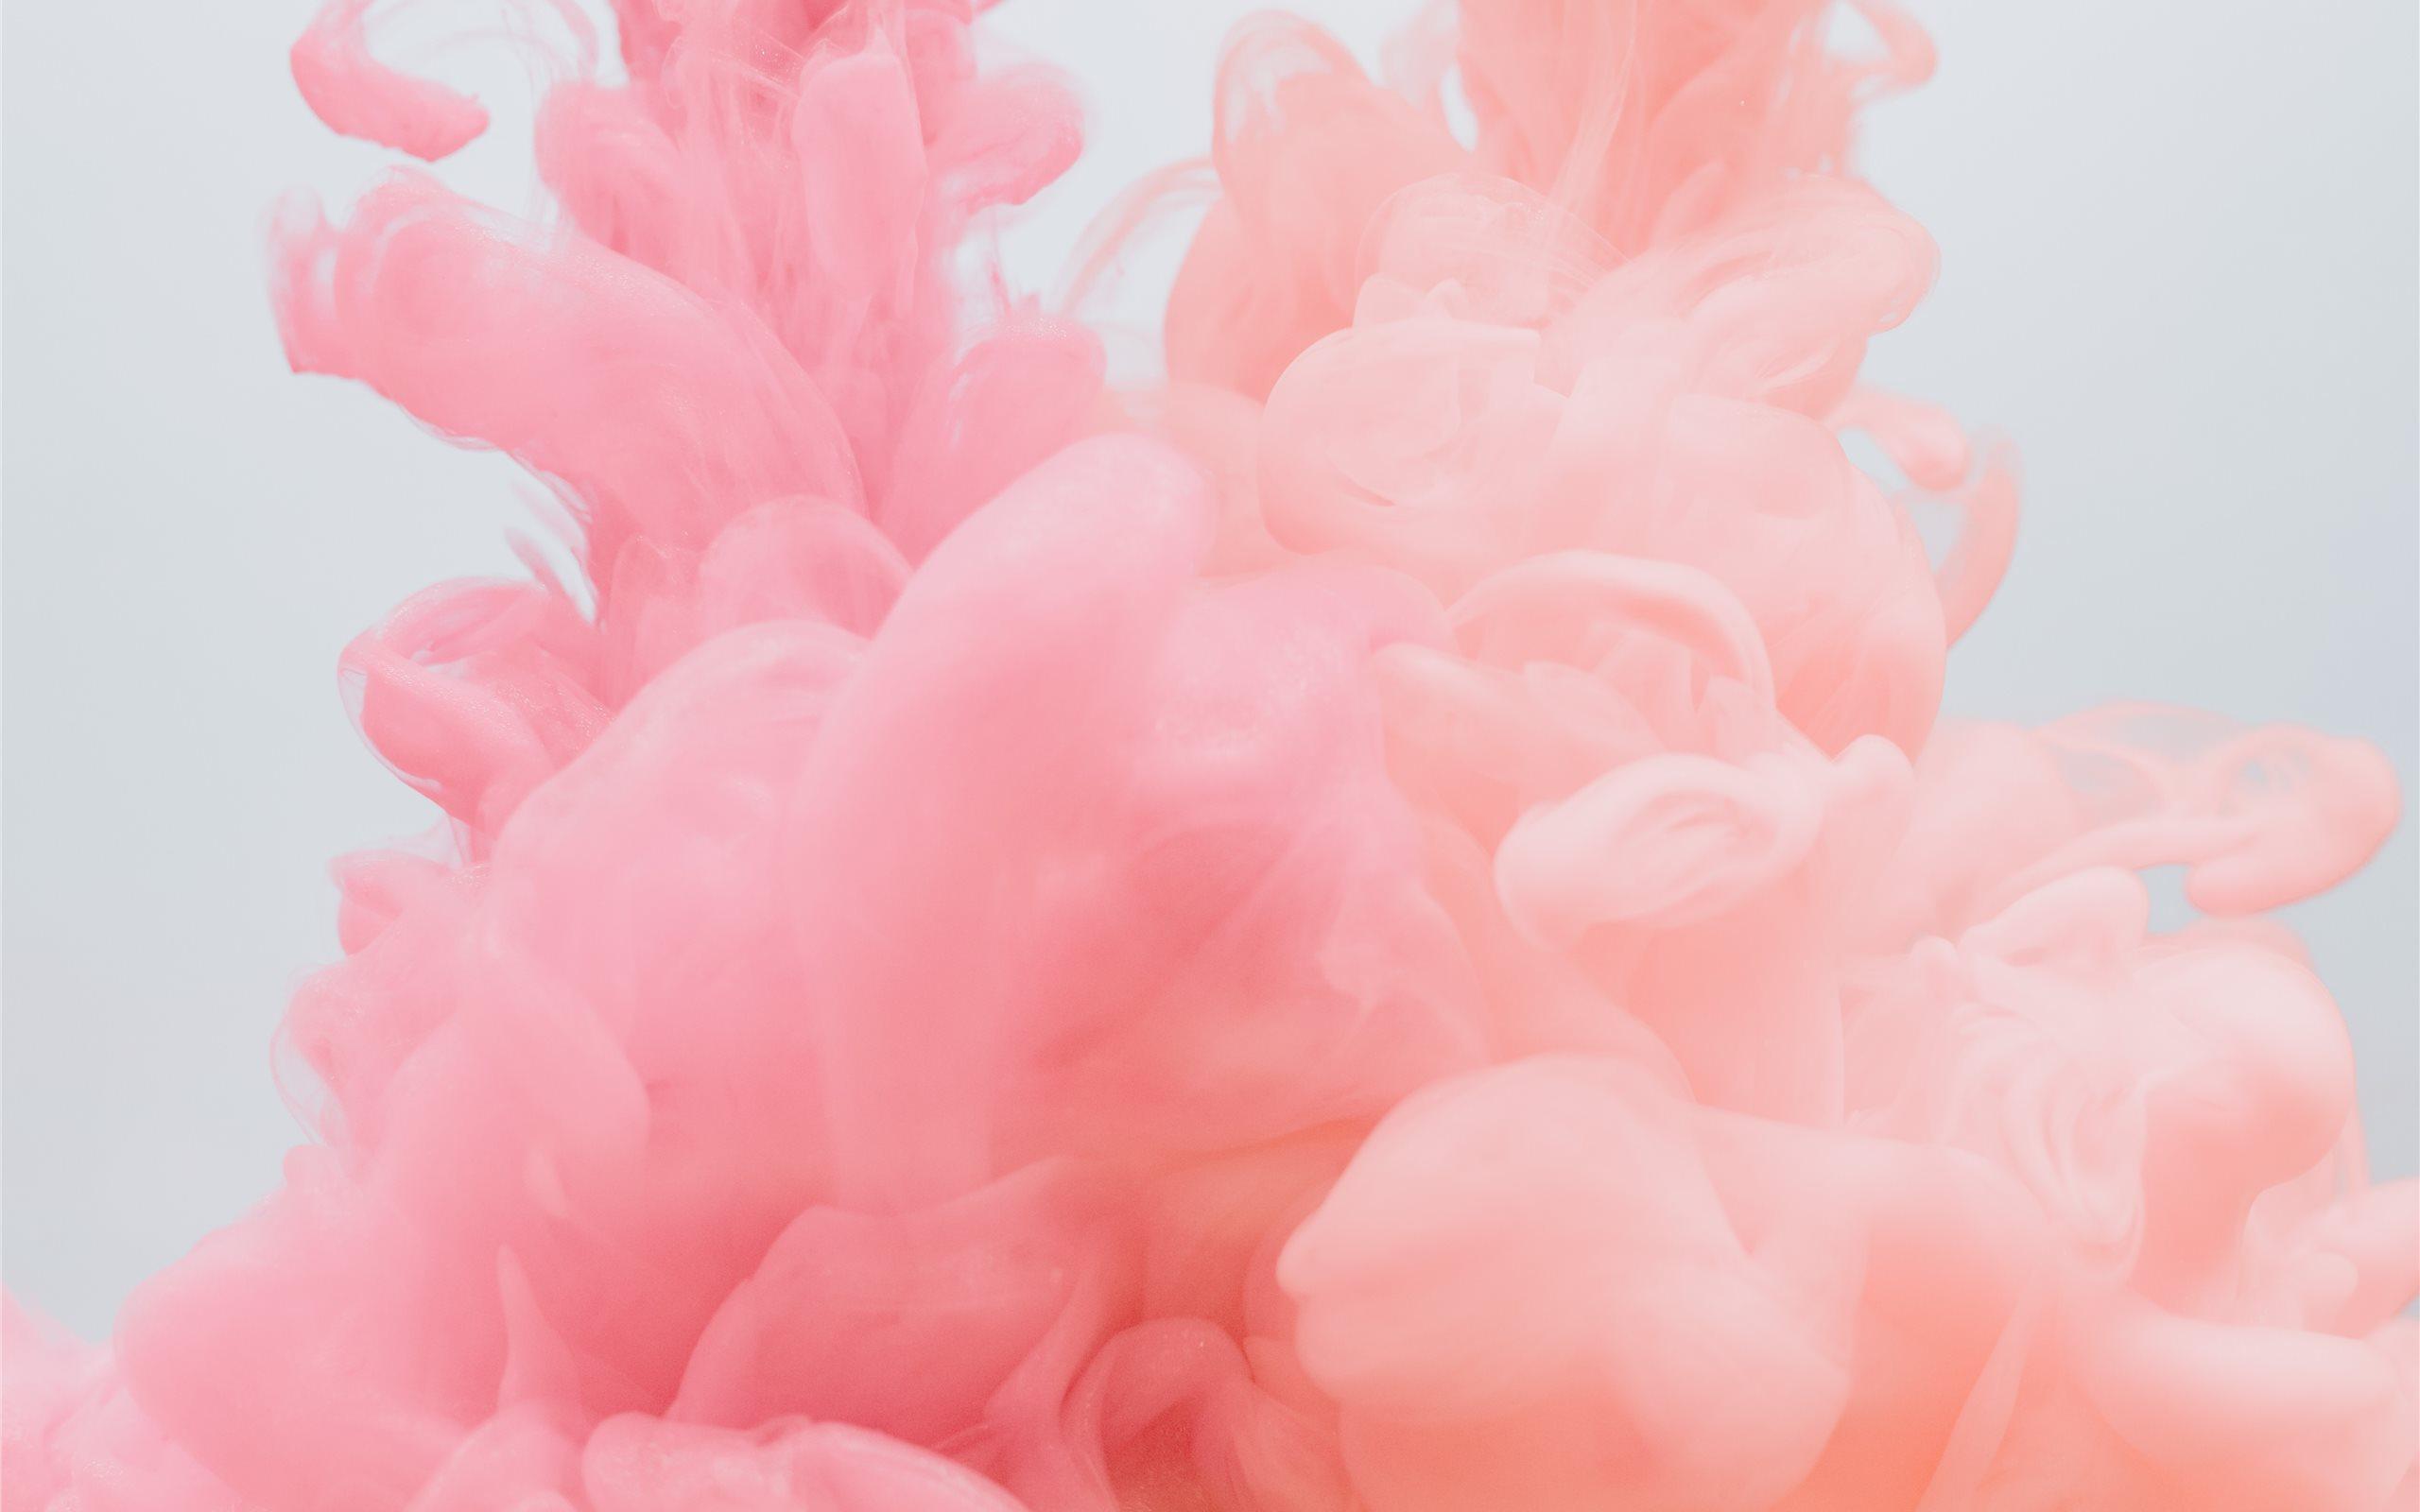 Macbook Air Wallpaper Pink 2560x1600 Wallpaper Teahub Io